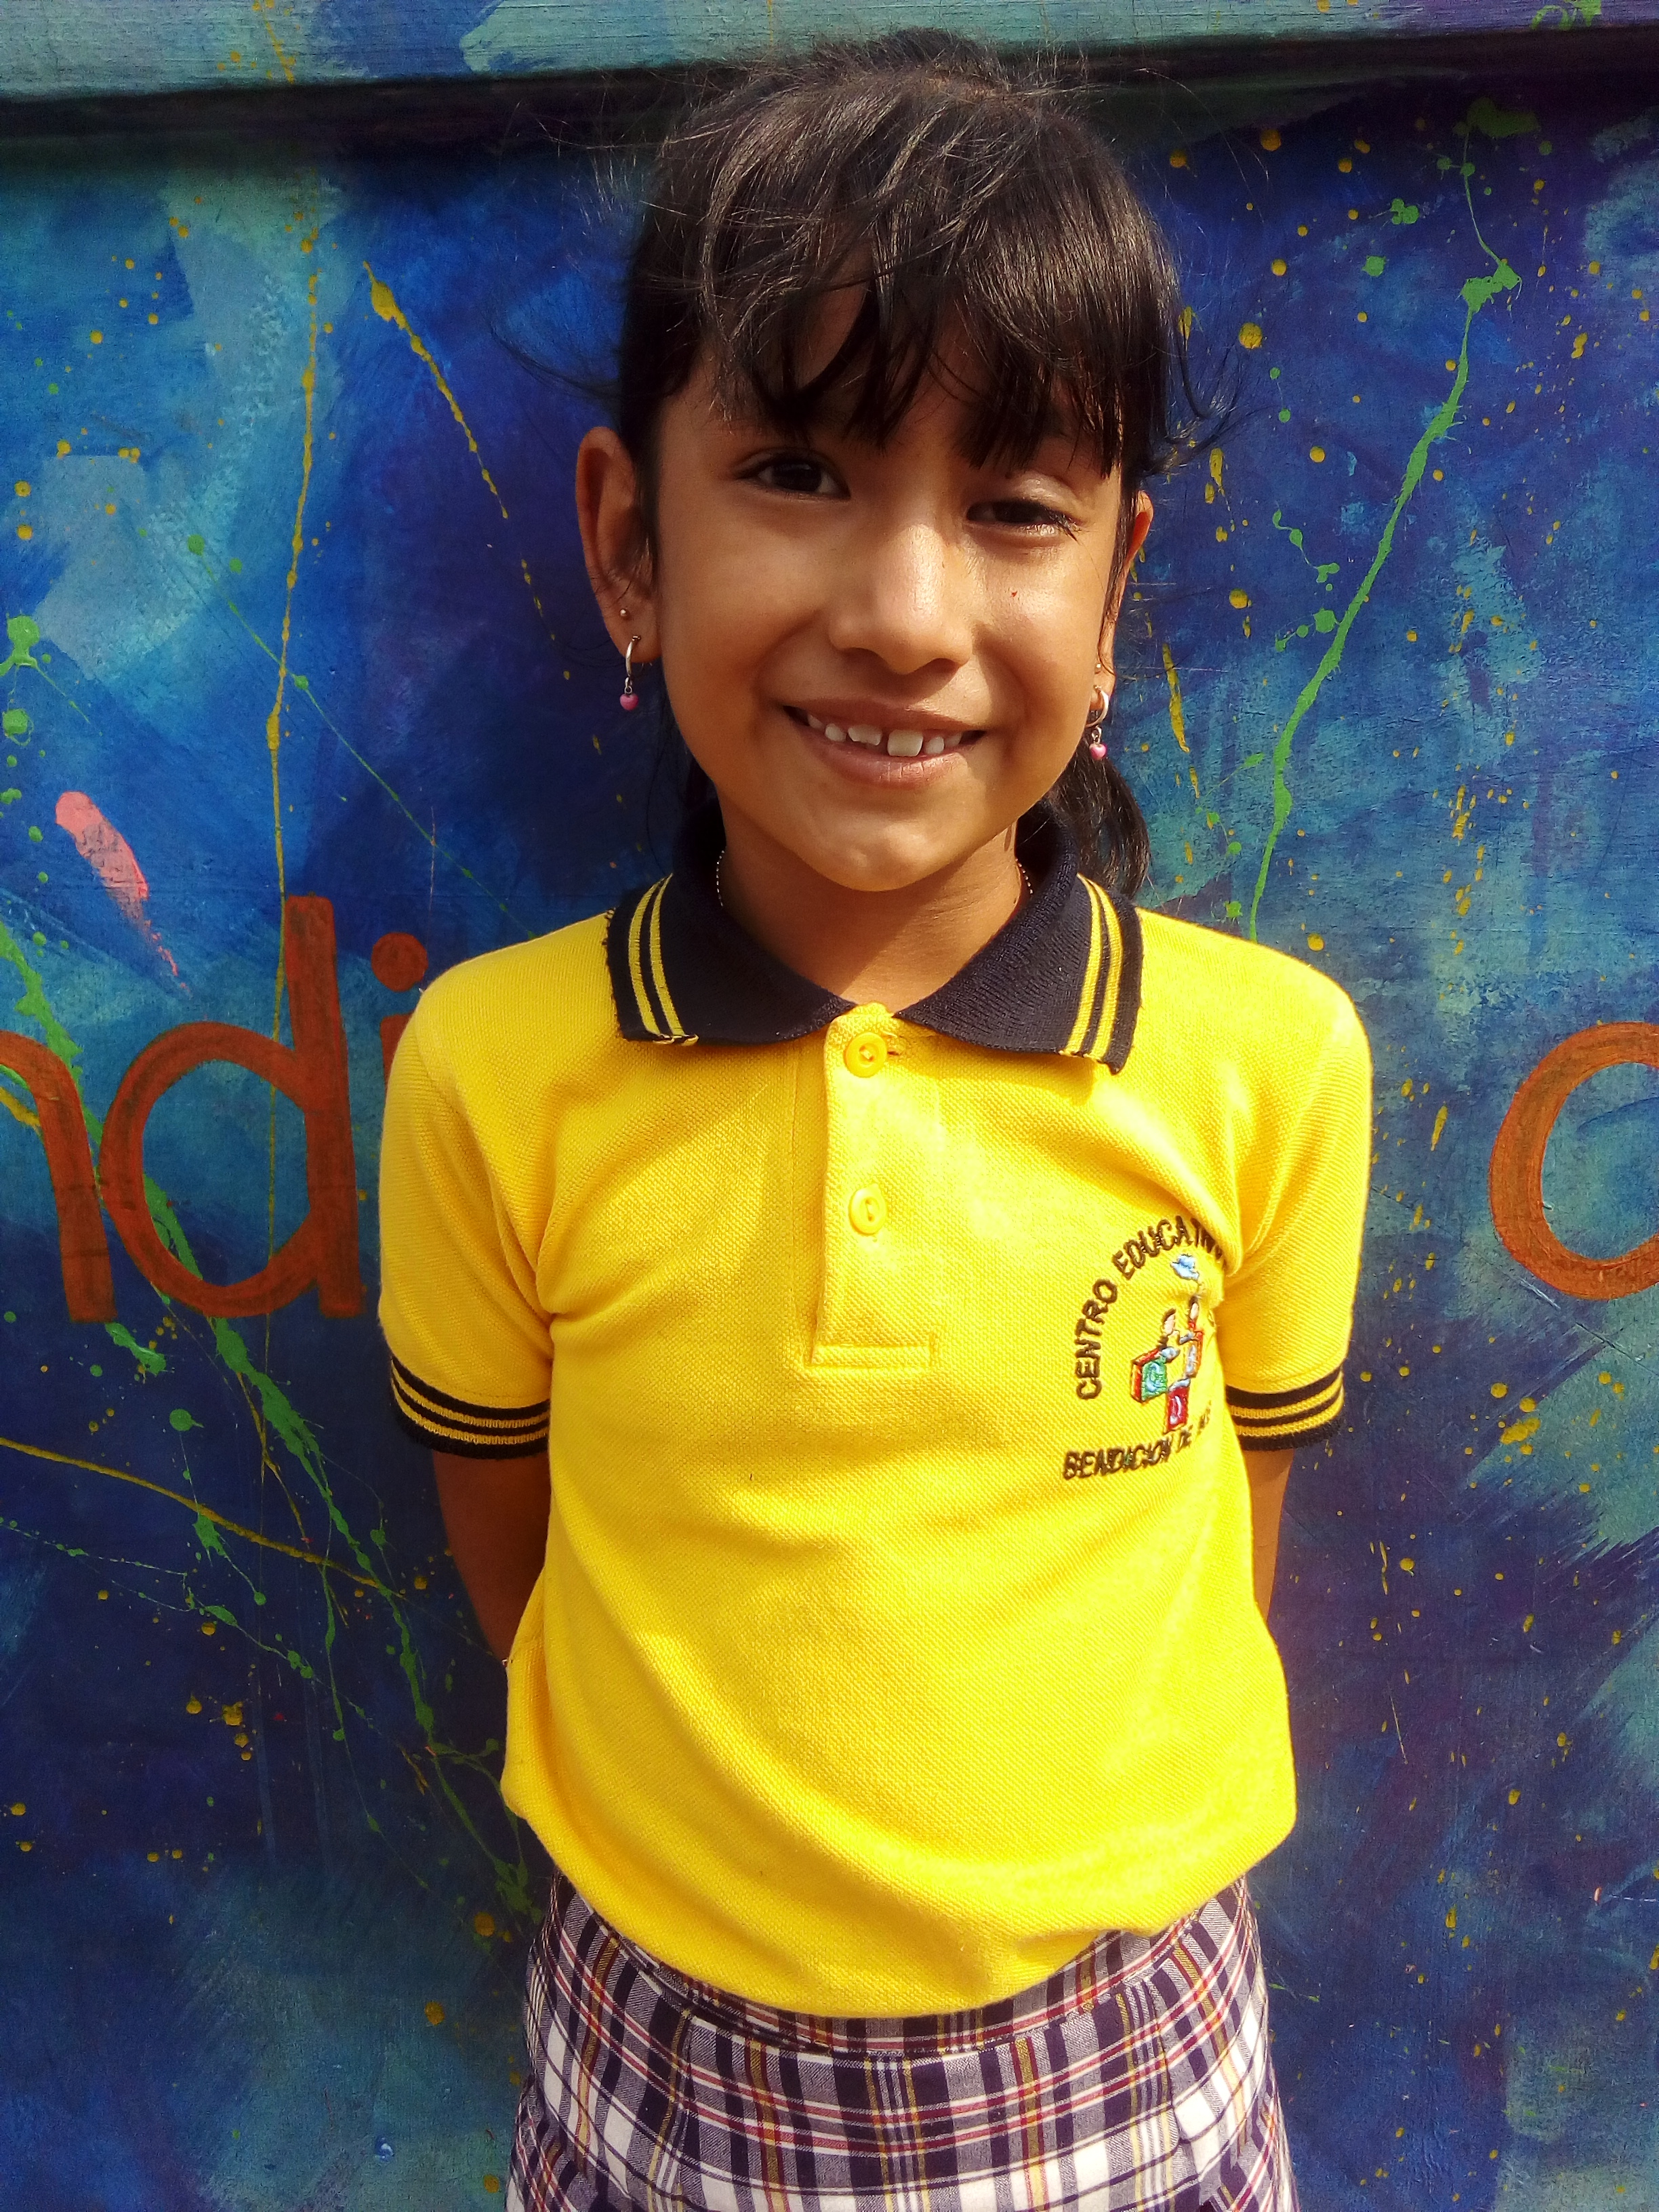 Keytlyn Mariana Cuellar Aquino